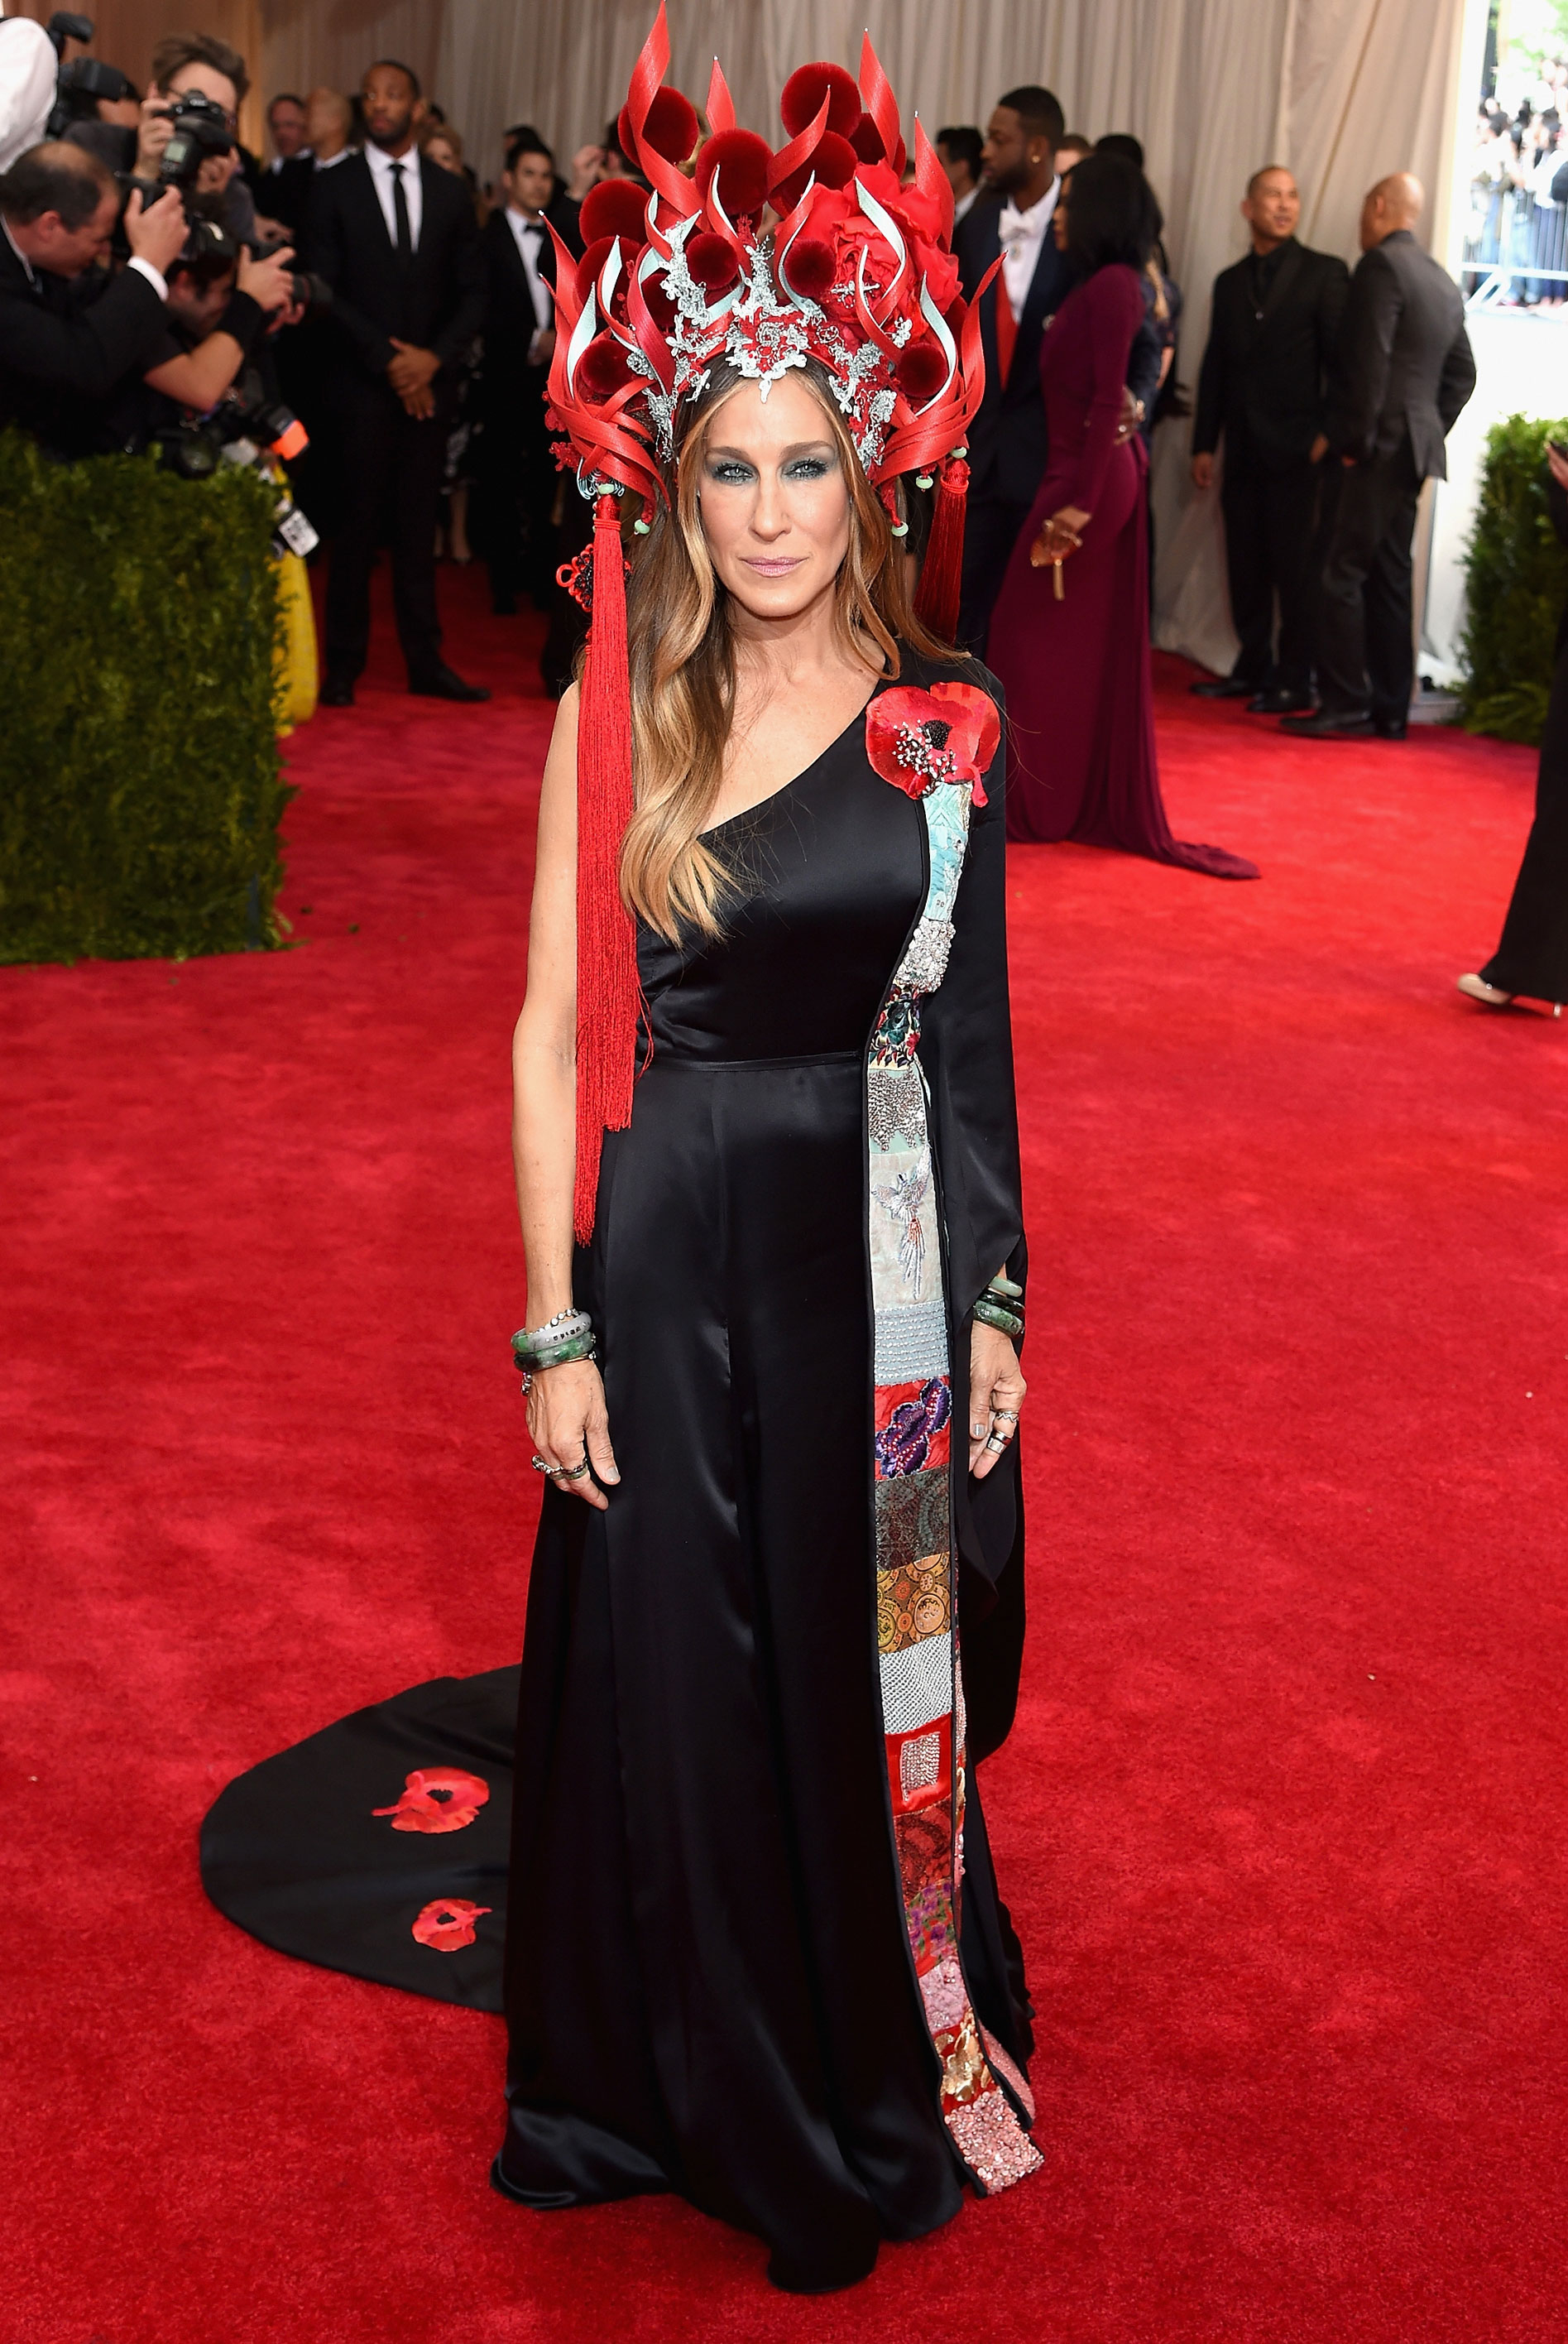 Sarah Jessica Parker - In a Philip Treacy headdress and custom H&M dress.